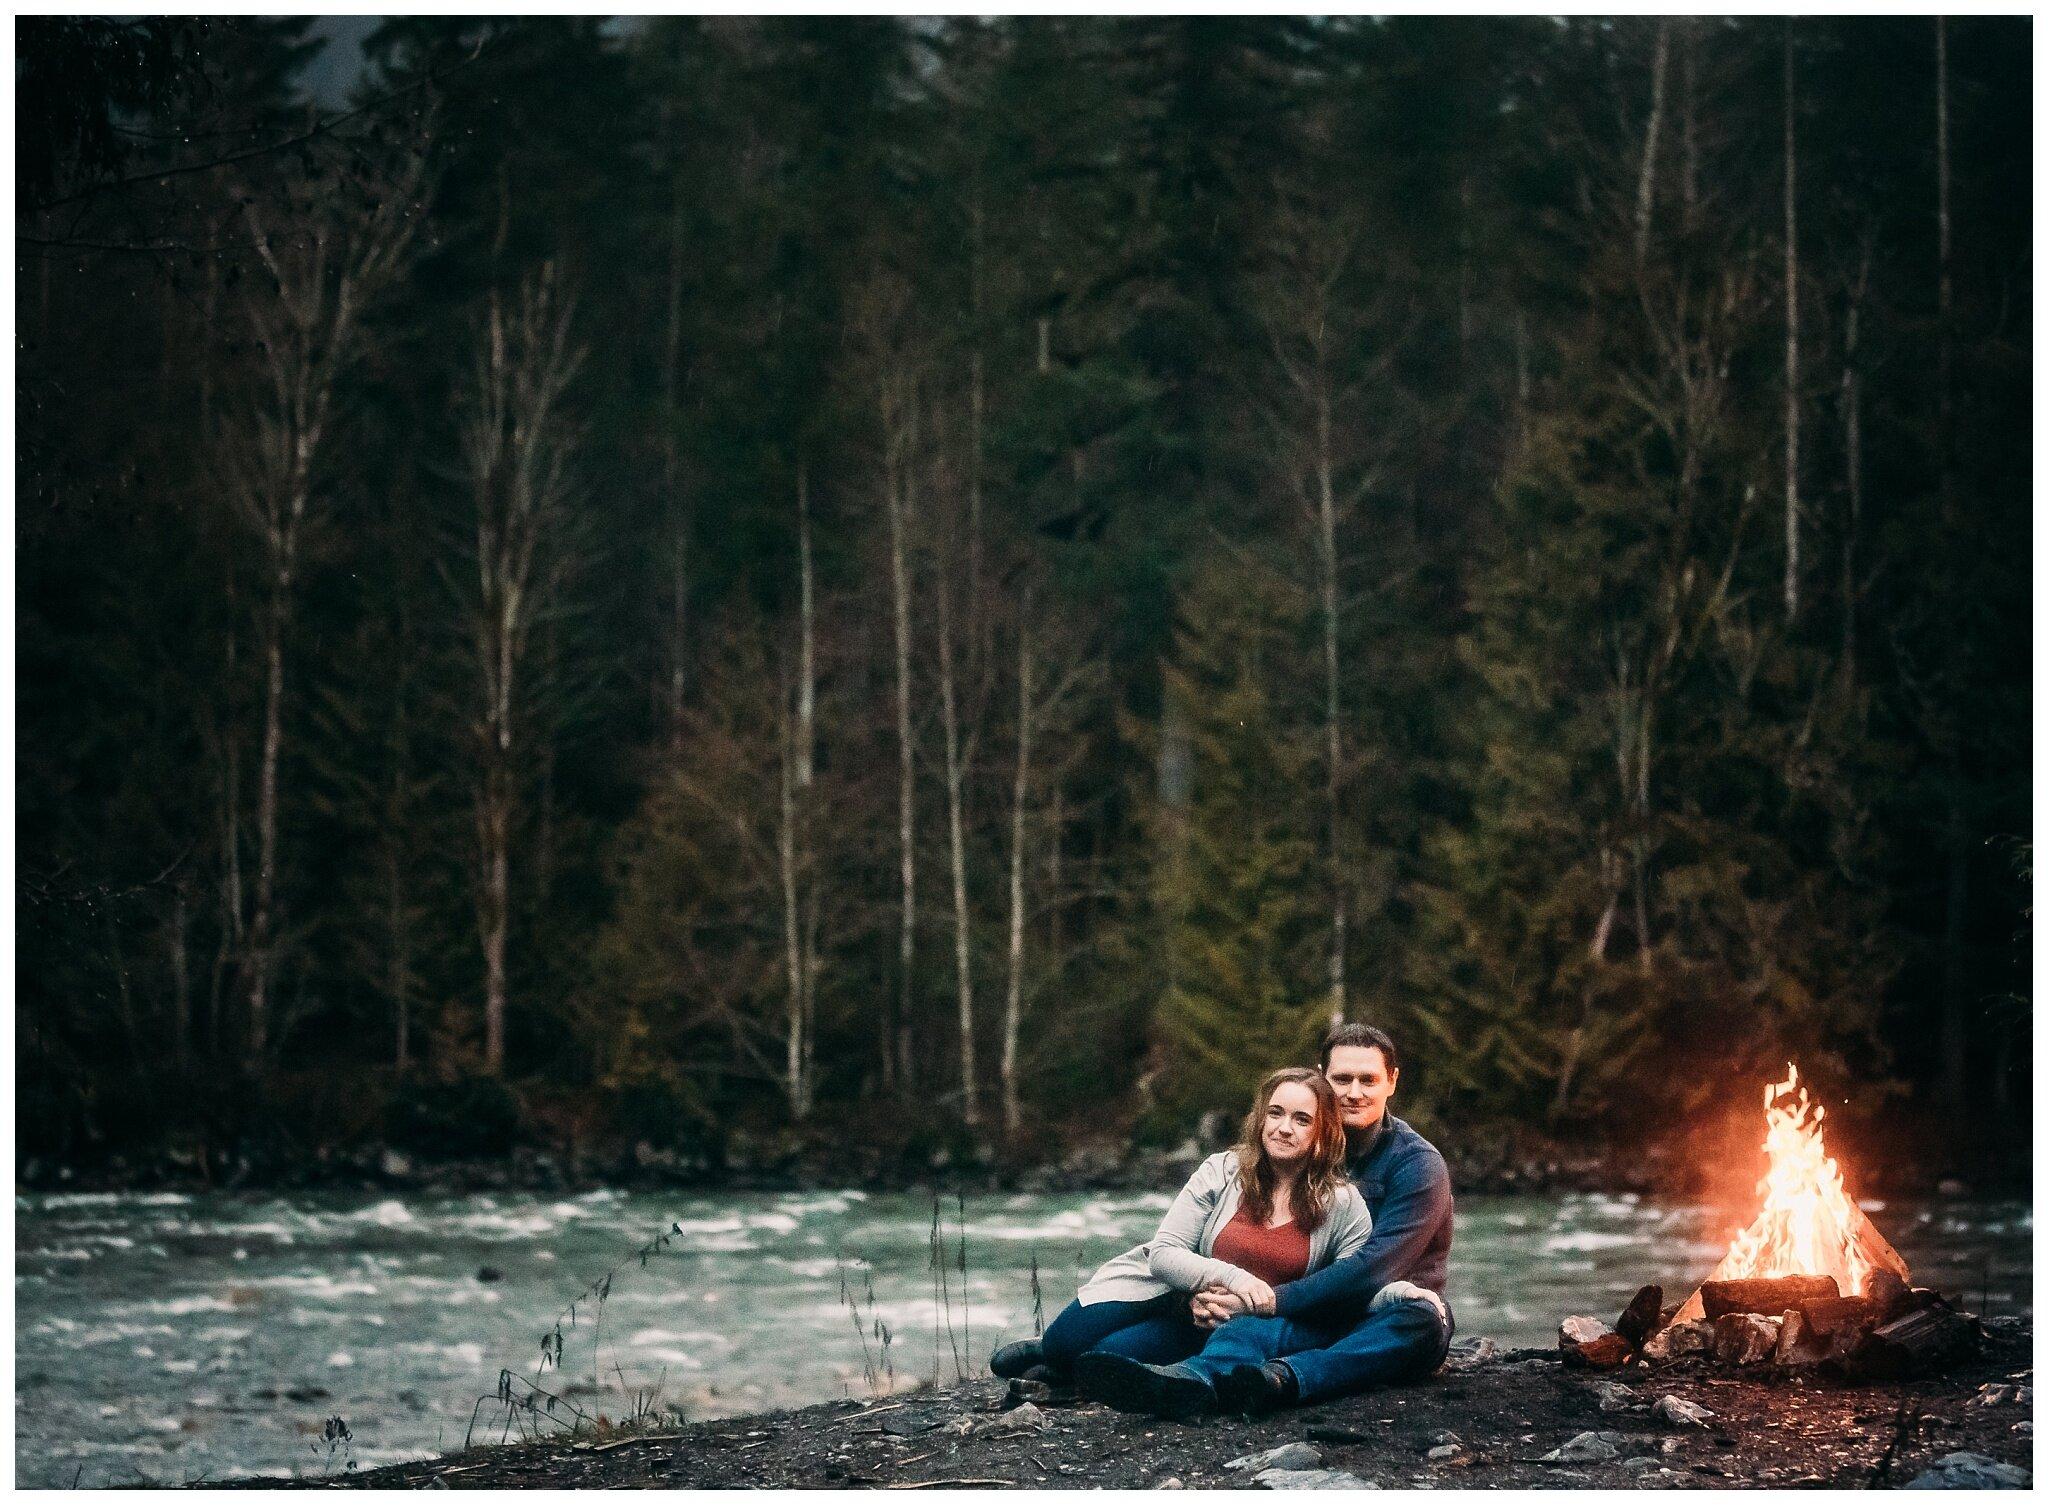 Chilliwack Lake Rainy Winter Engagement Photography Session Couples Photographer_0022.jpg